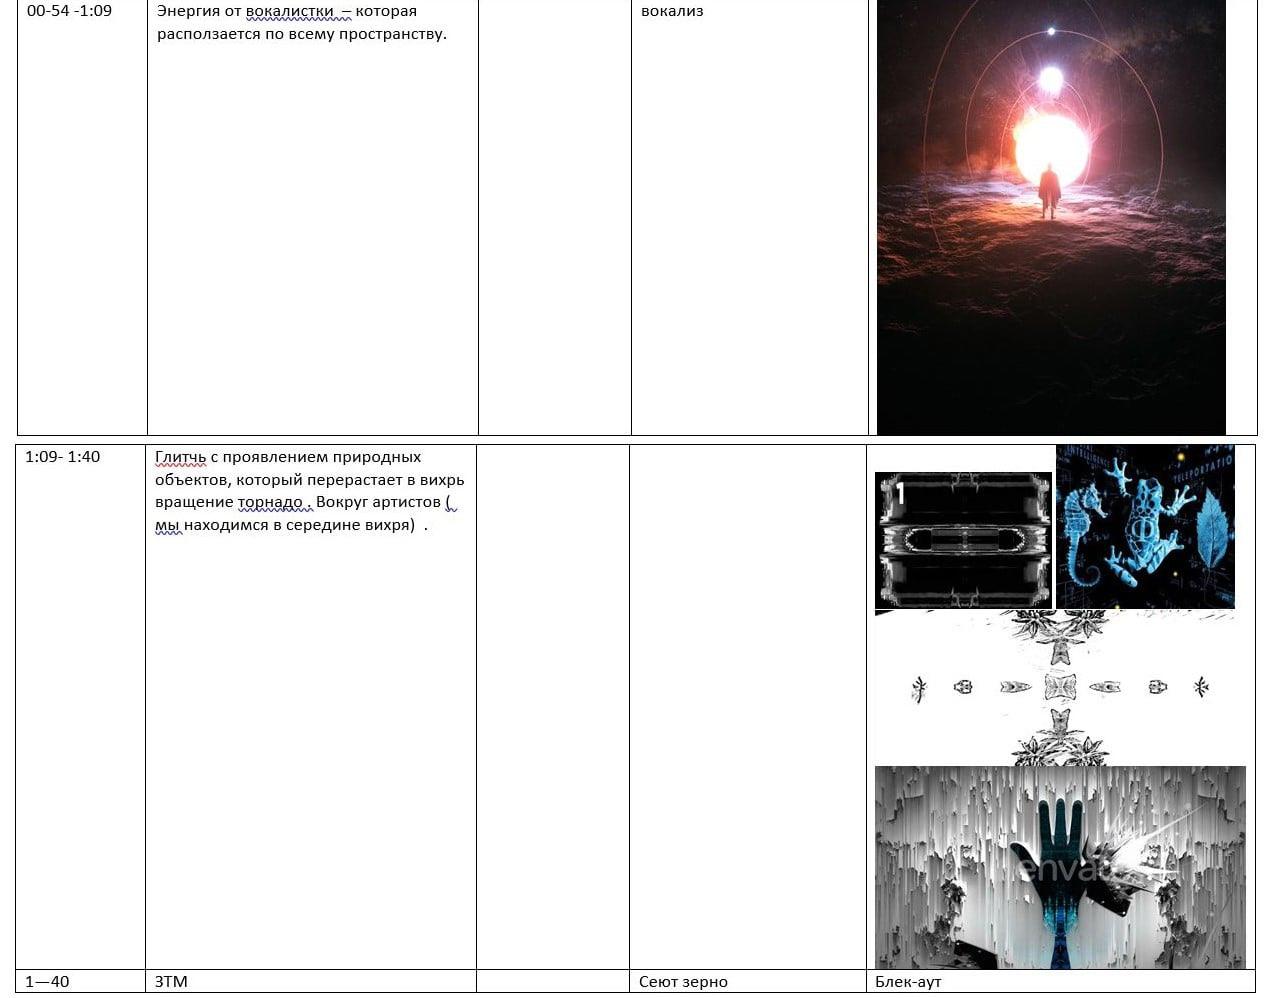 -CtLDHKzi9M.jpg?size=1264x998&quality=96&sign=d75bf022b2397dee90b873bdf09c4e7a&type=album